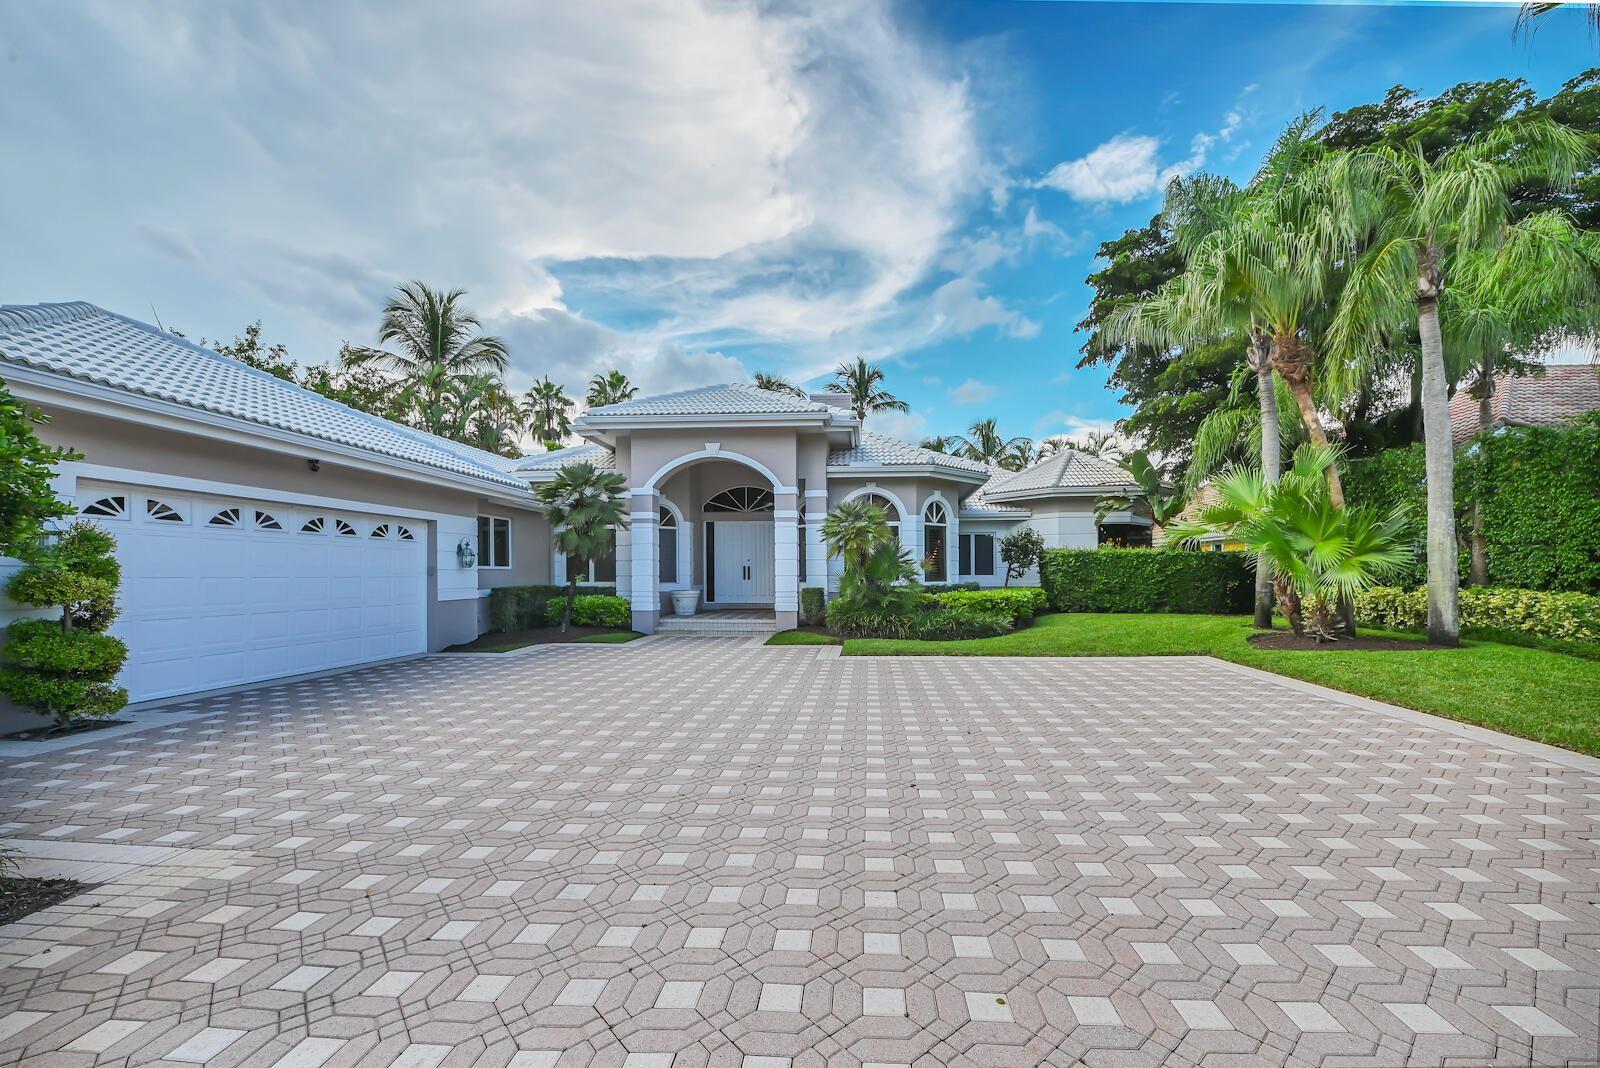 Photo of 26 St George Place, Palm Beach Gardens, FL 33418 (MLS # RX-10747725)